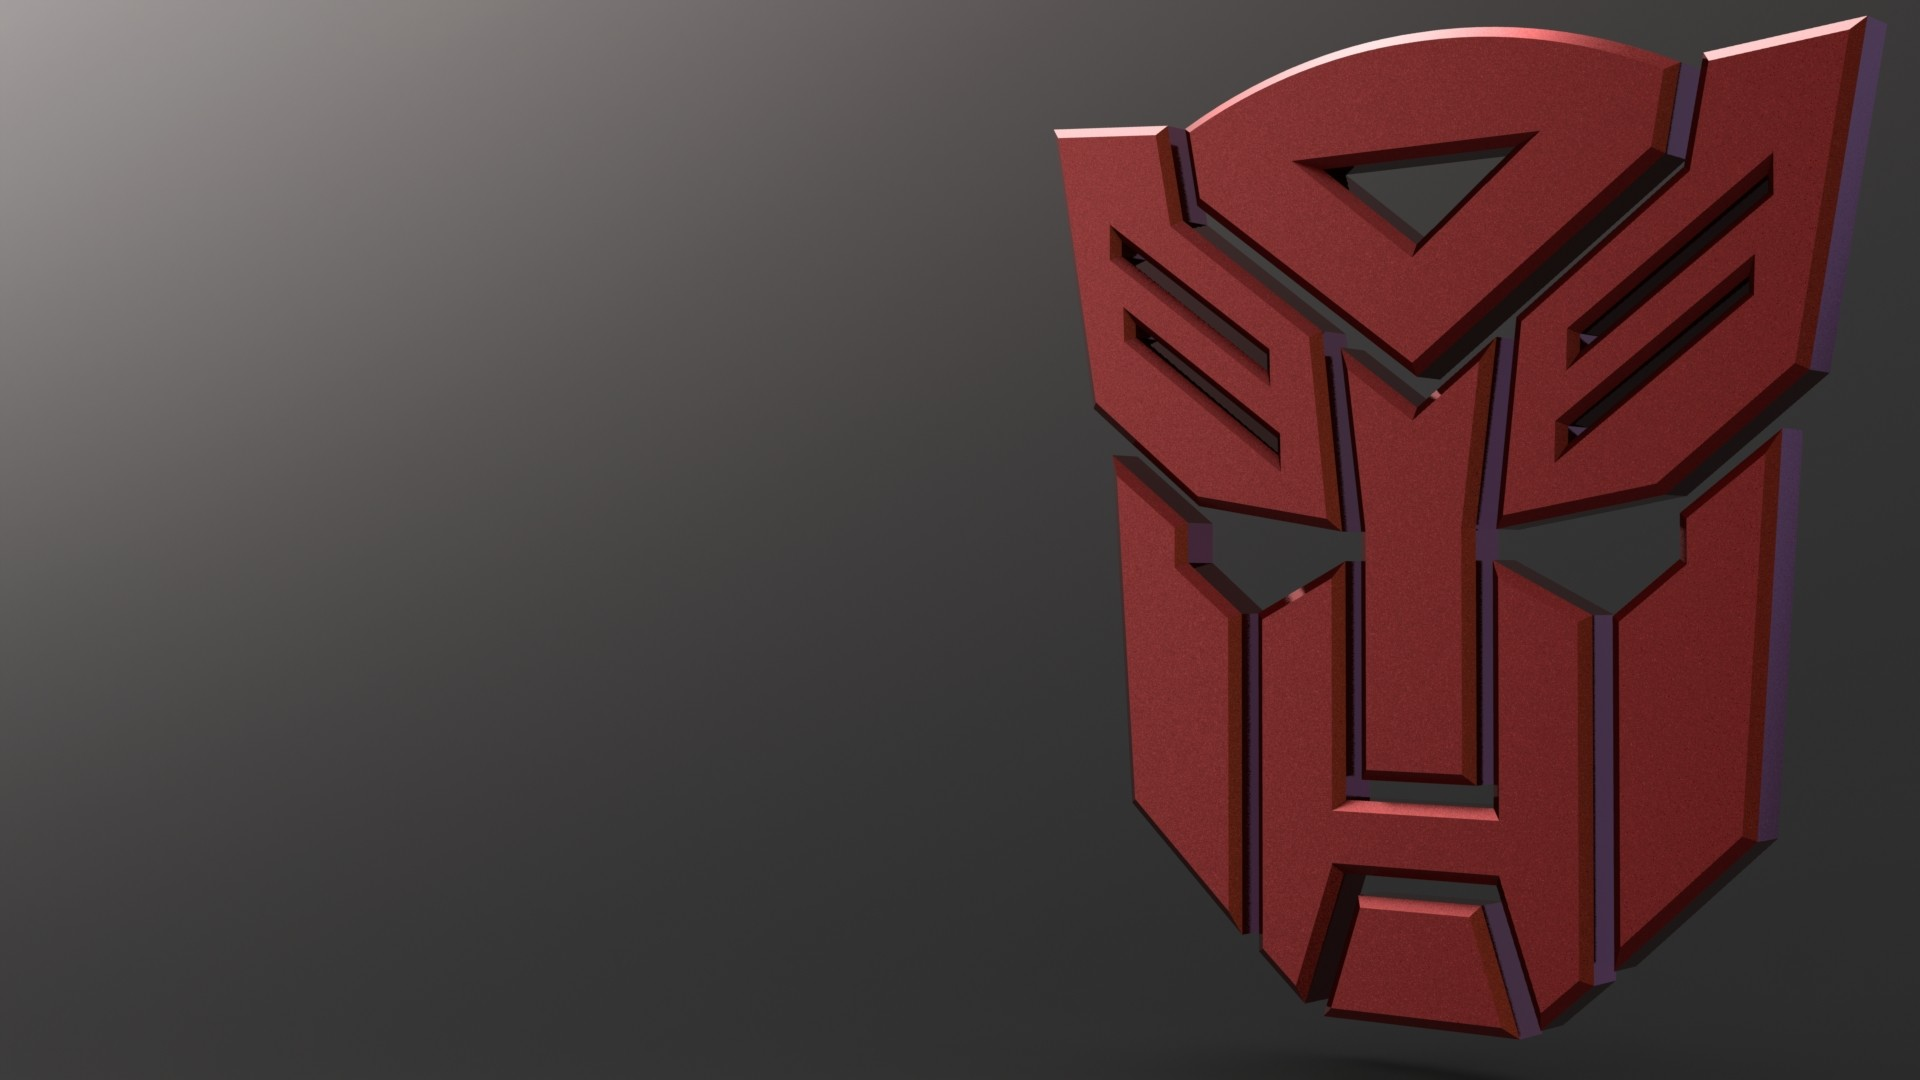 Transformers Wallpaper Autobots 139040